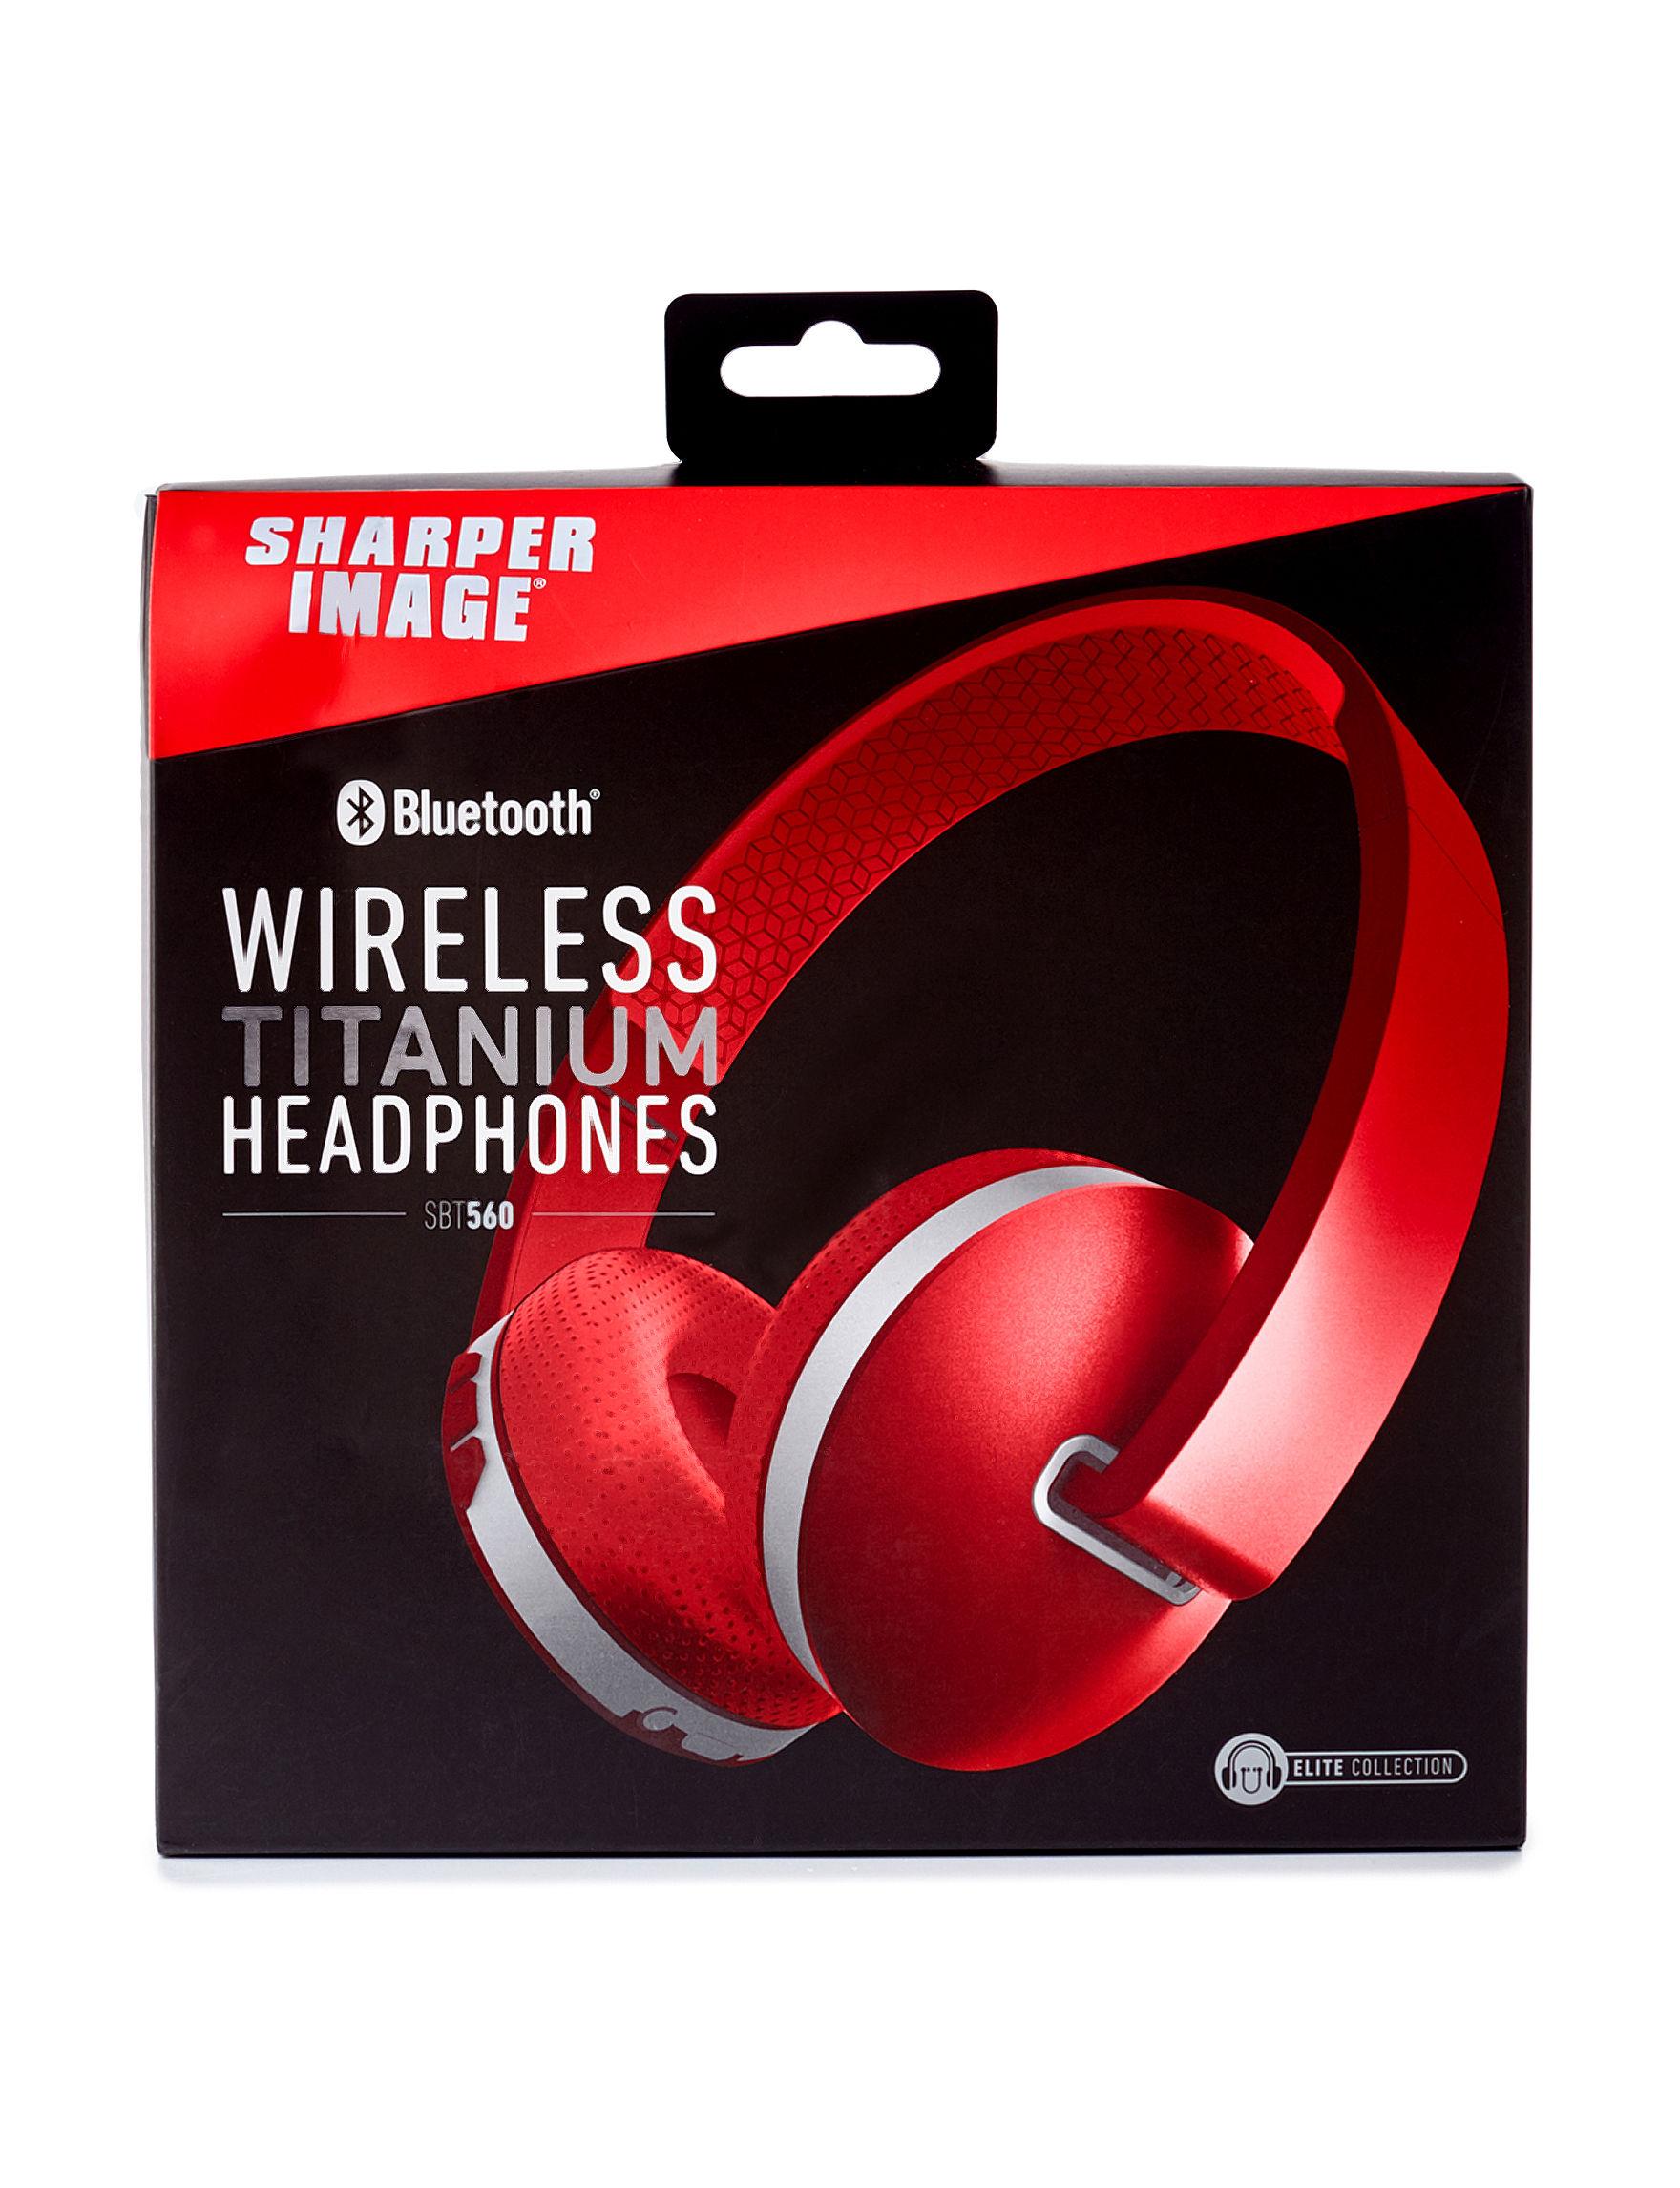 Sharper Image Red Headphones Home & Portable Audio Tech Accessories